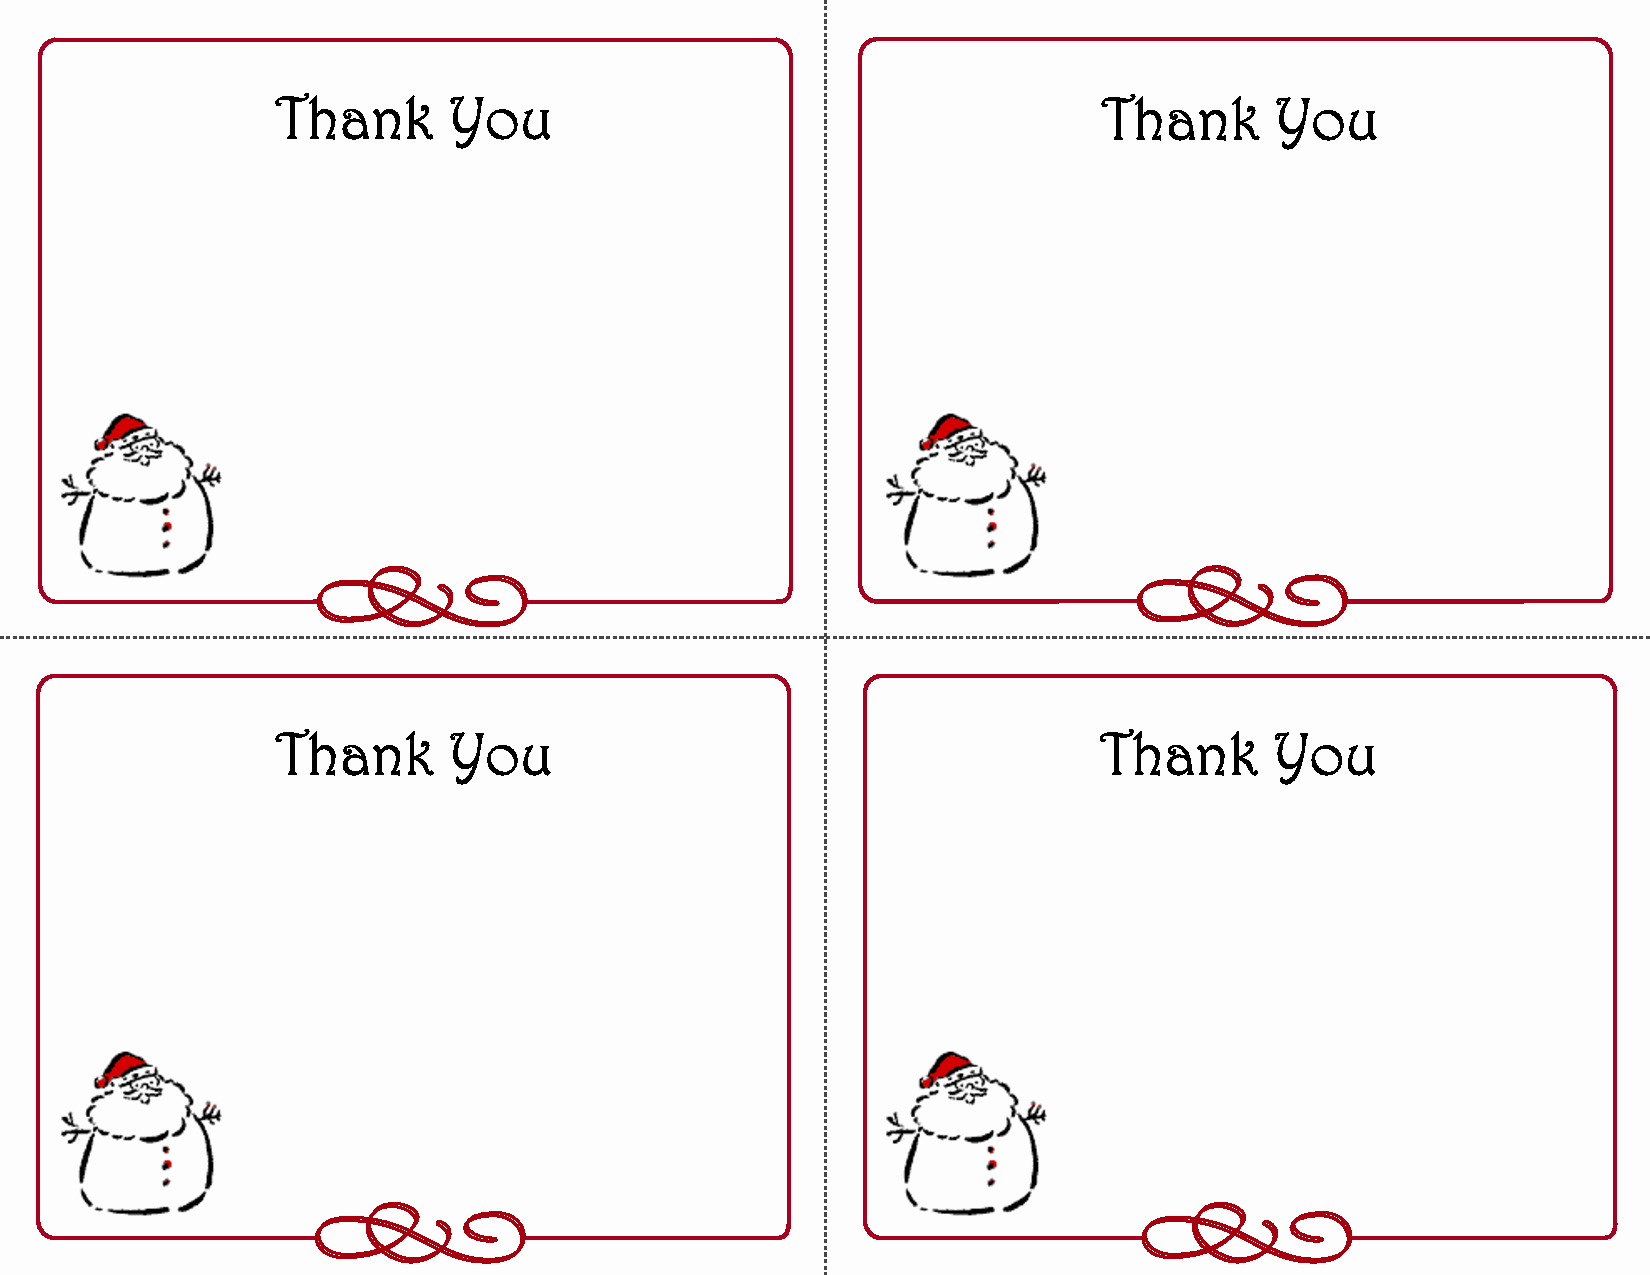 Free Printable Thank You Certificates Inspirational Printable Christmas Thank You Card Templates